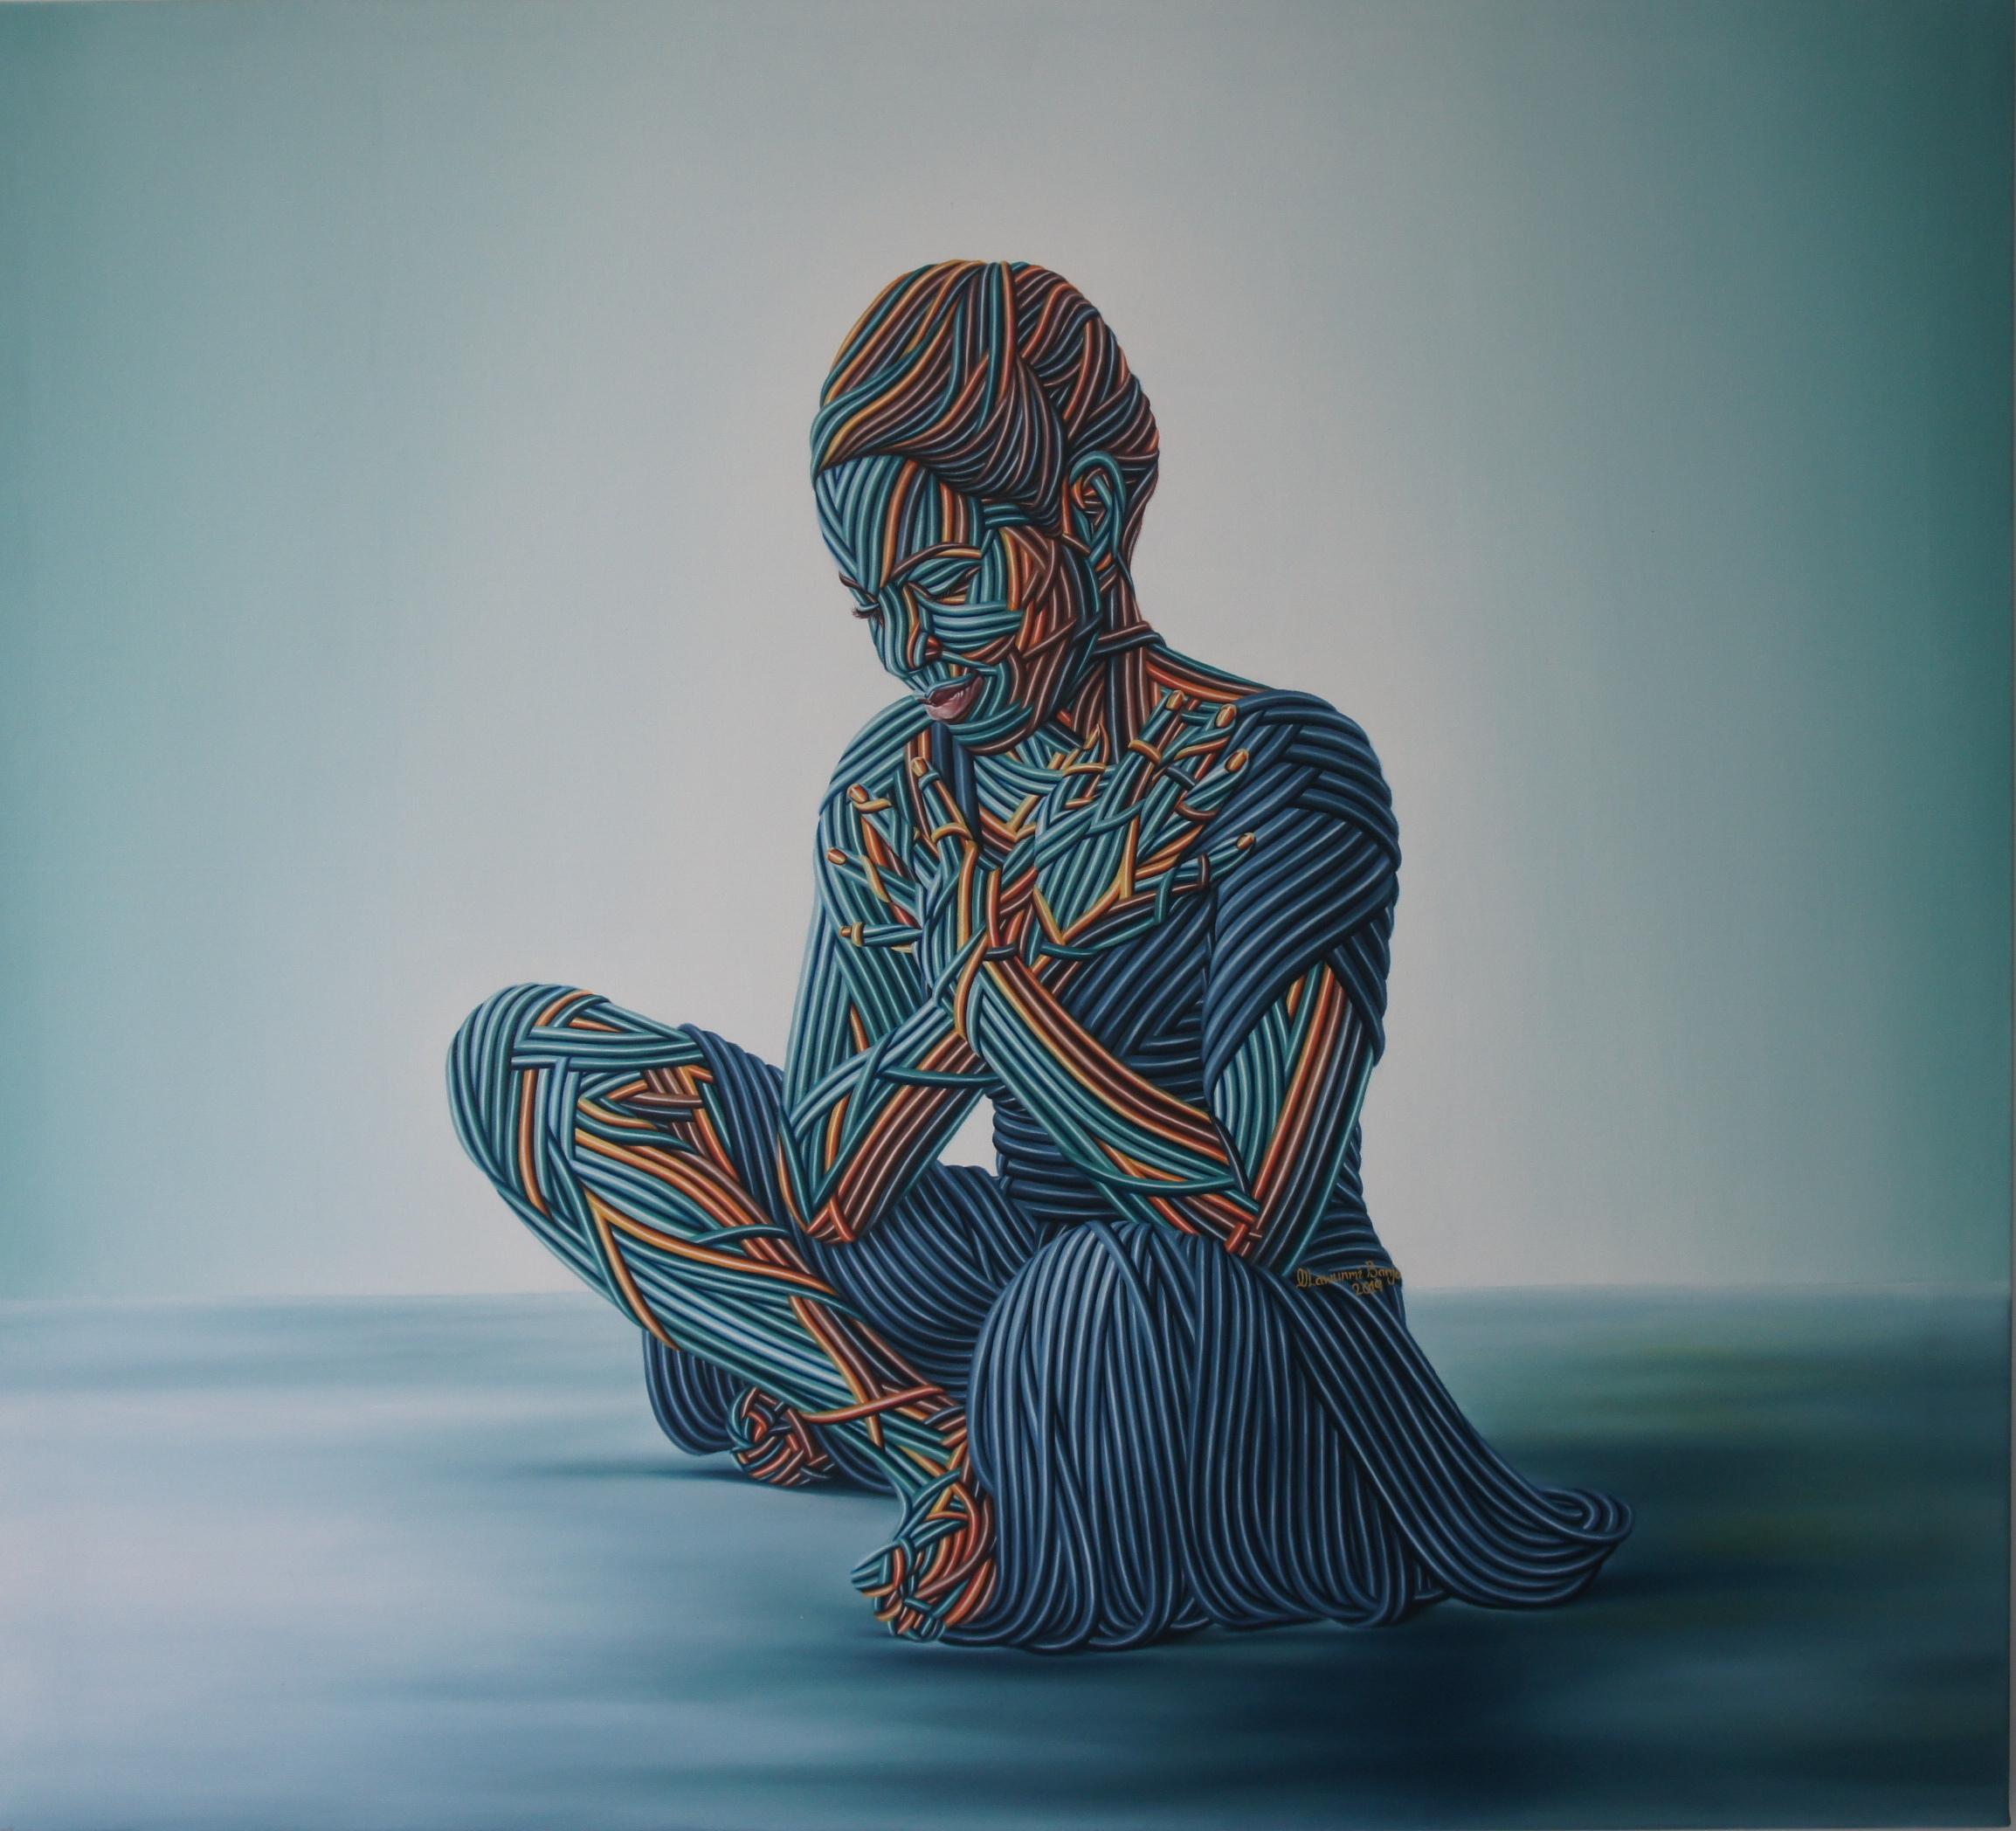 Inner Peace, Oil on canvas, 91 x 101 cm, 2019, Olawunmi Banjo